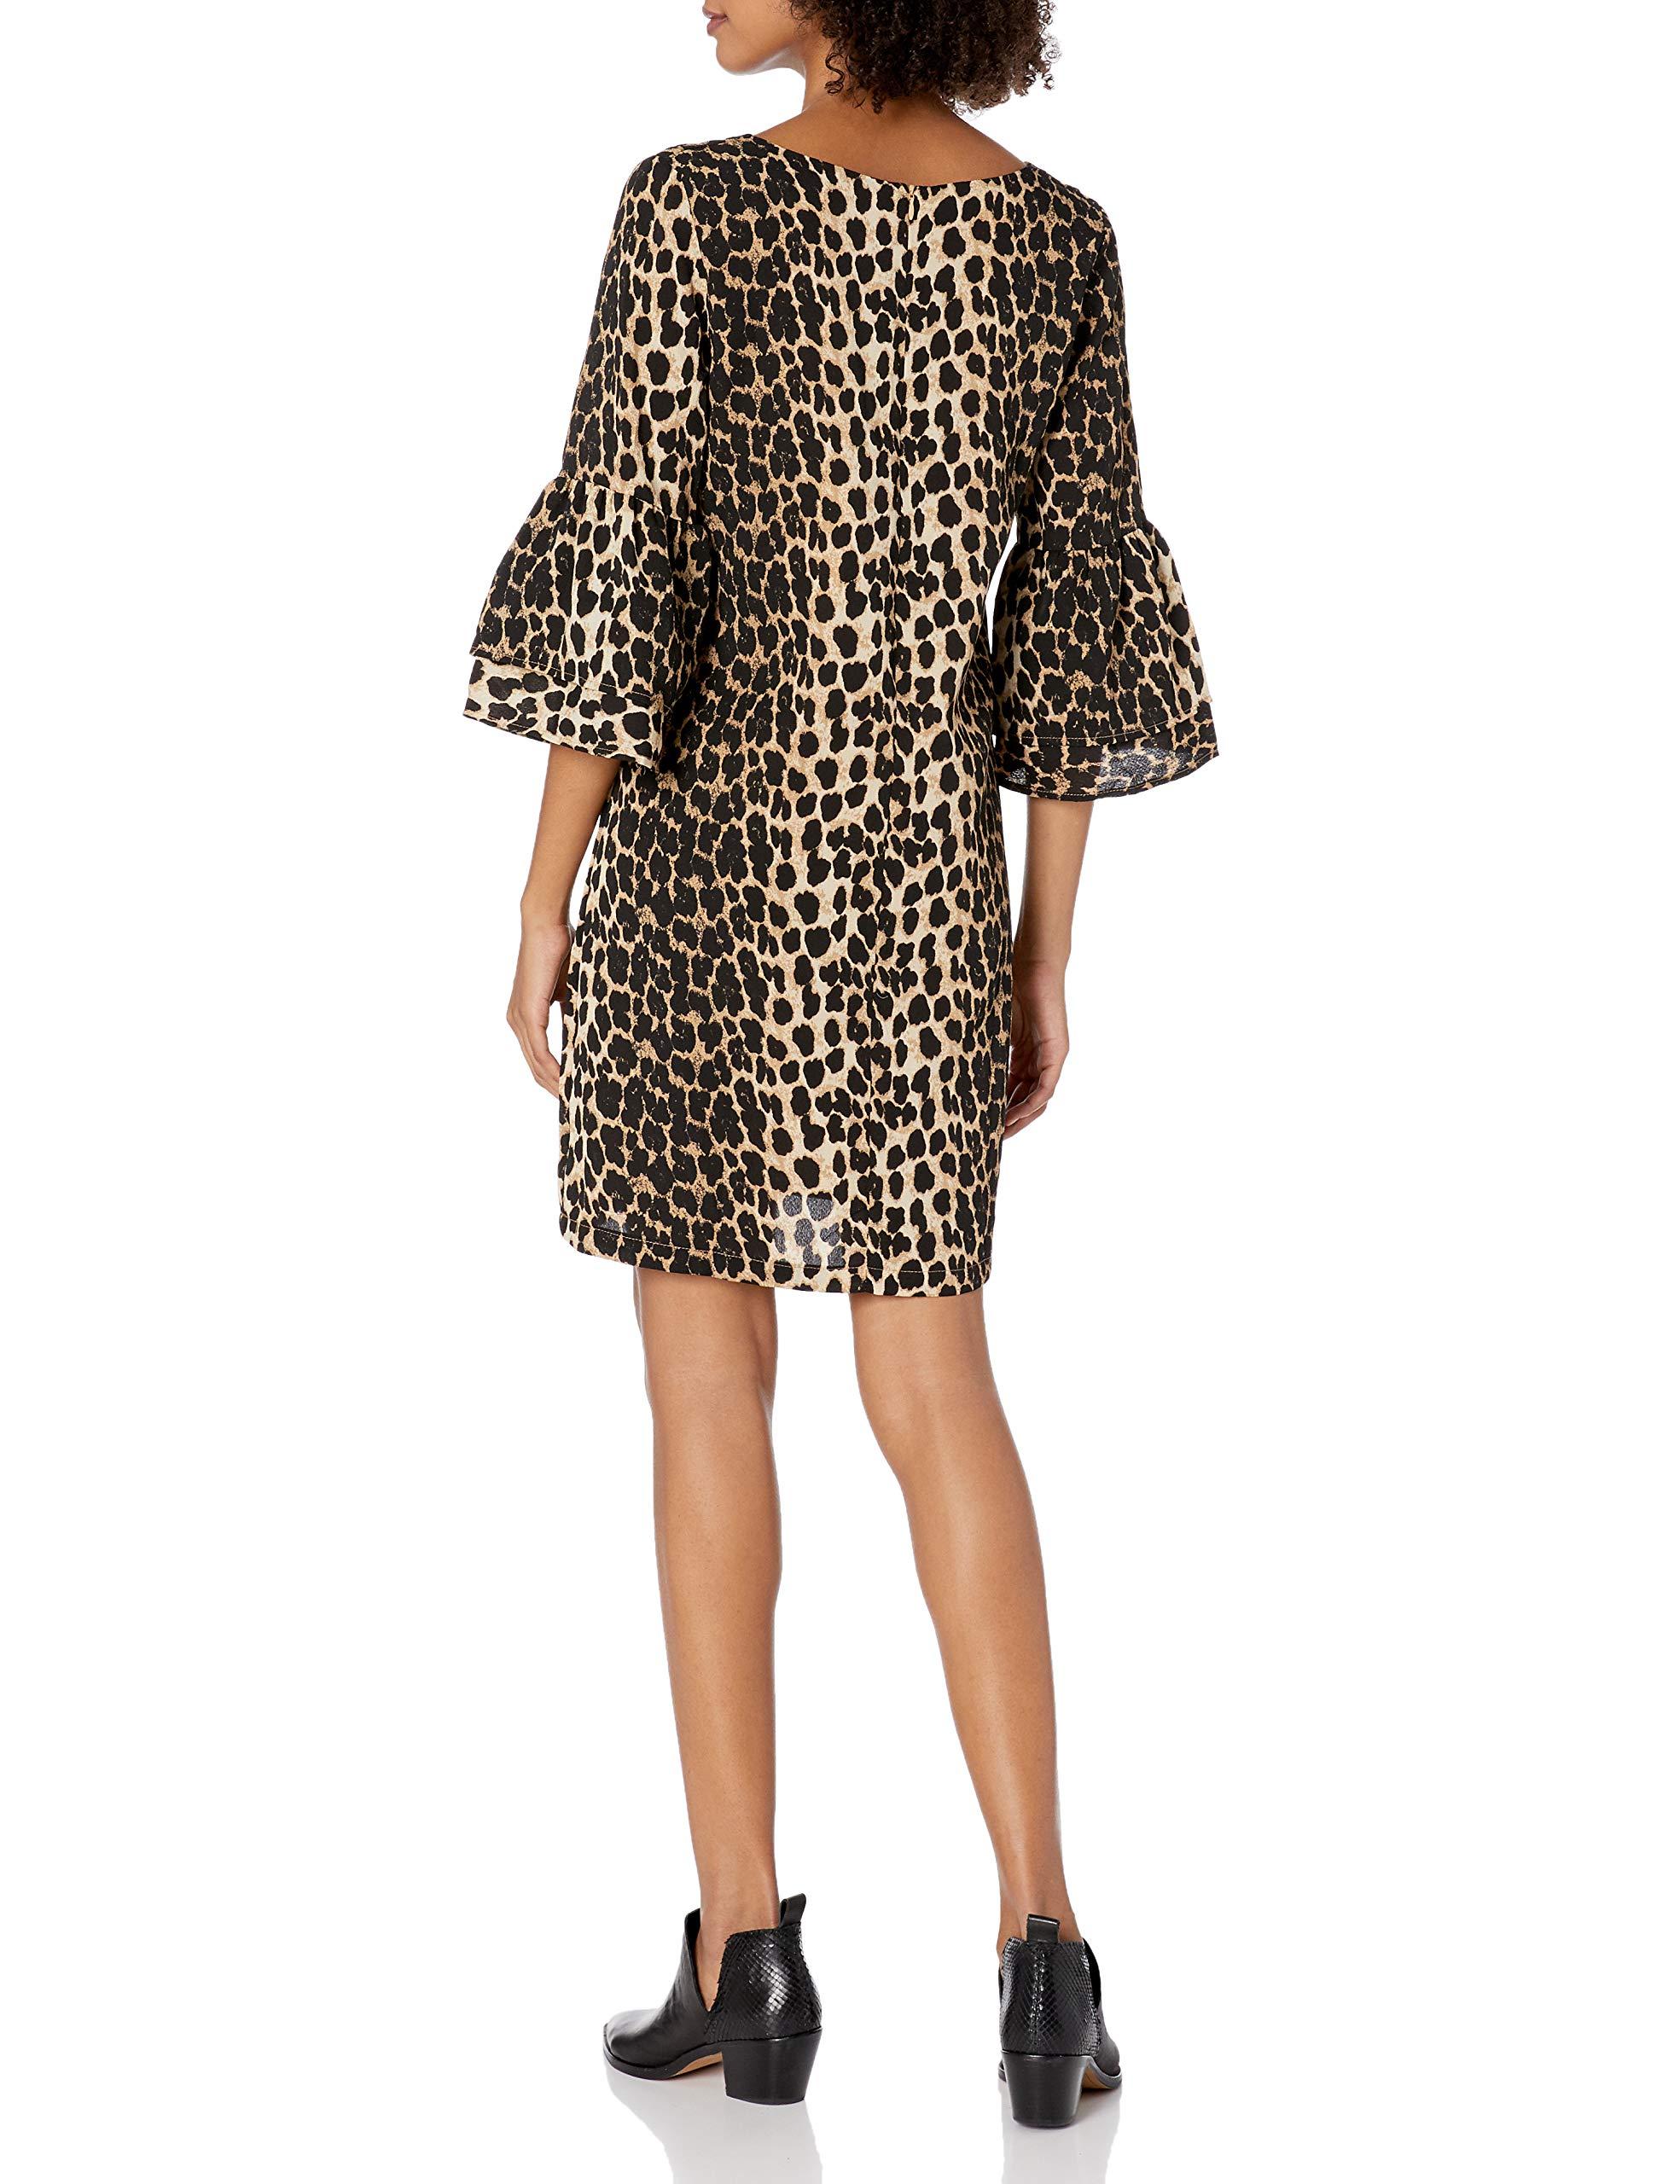 BELONGSCI-Womens-Dress-Sweet-Cute-V-Neck-Bell-Sleeve-Shift-Dress-Mini-Dress